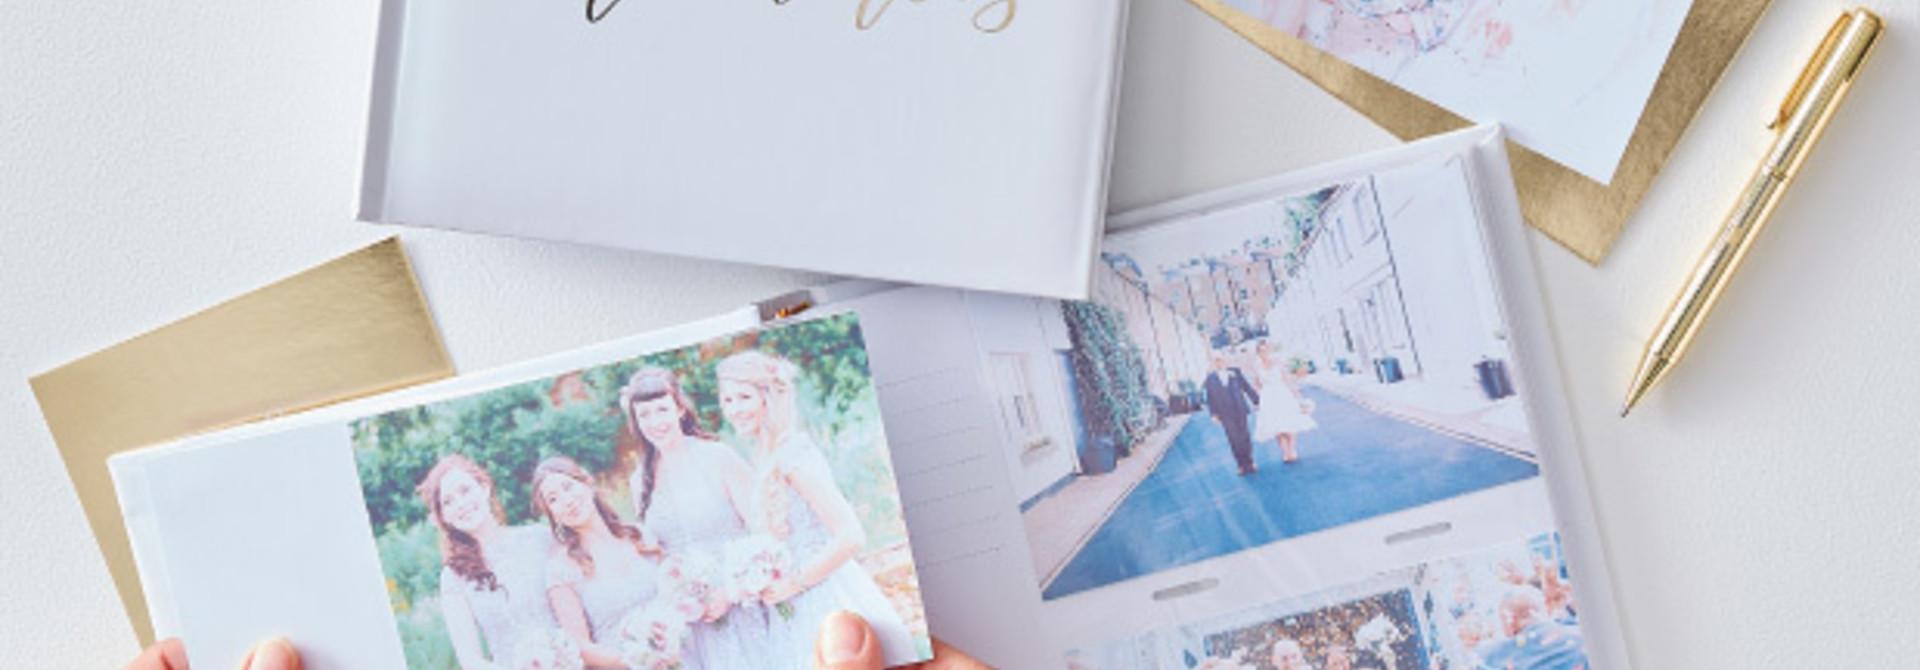 Fotoalbum Wedding Memories Gold Wedding - Ginger Ray